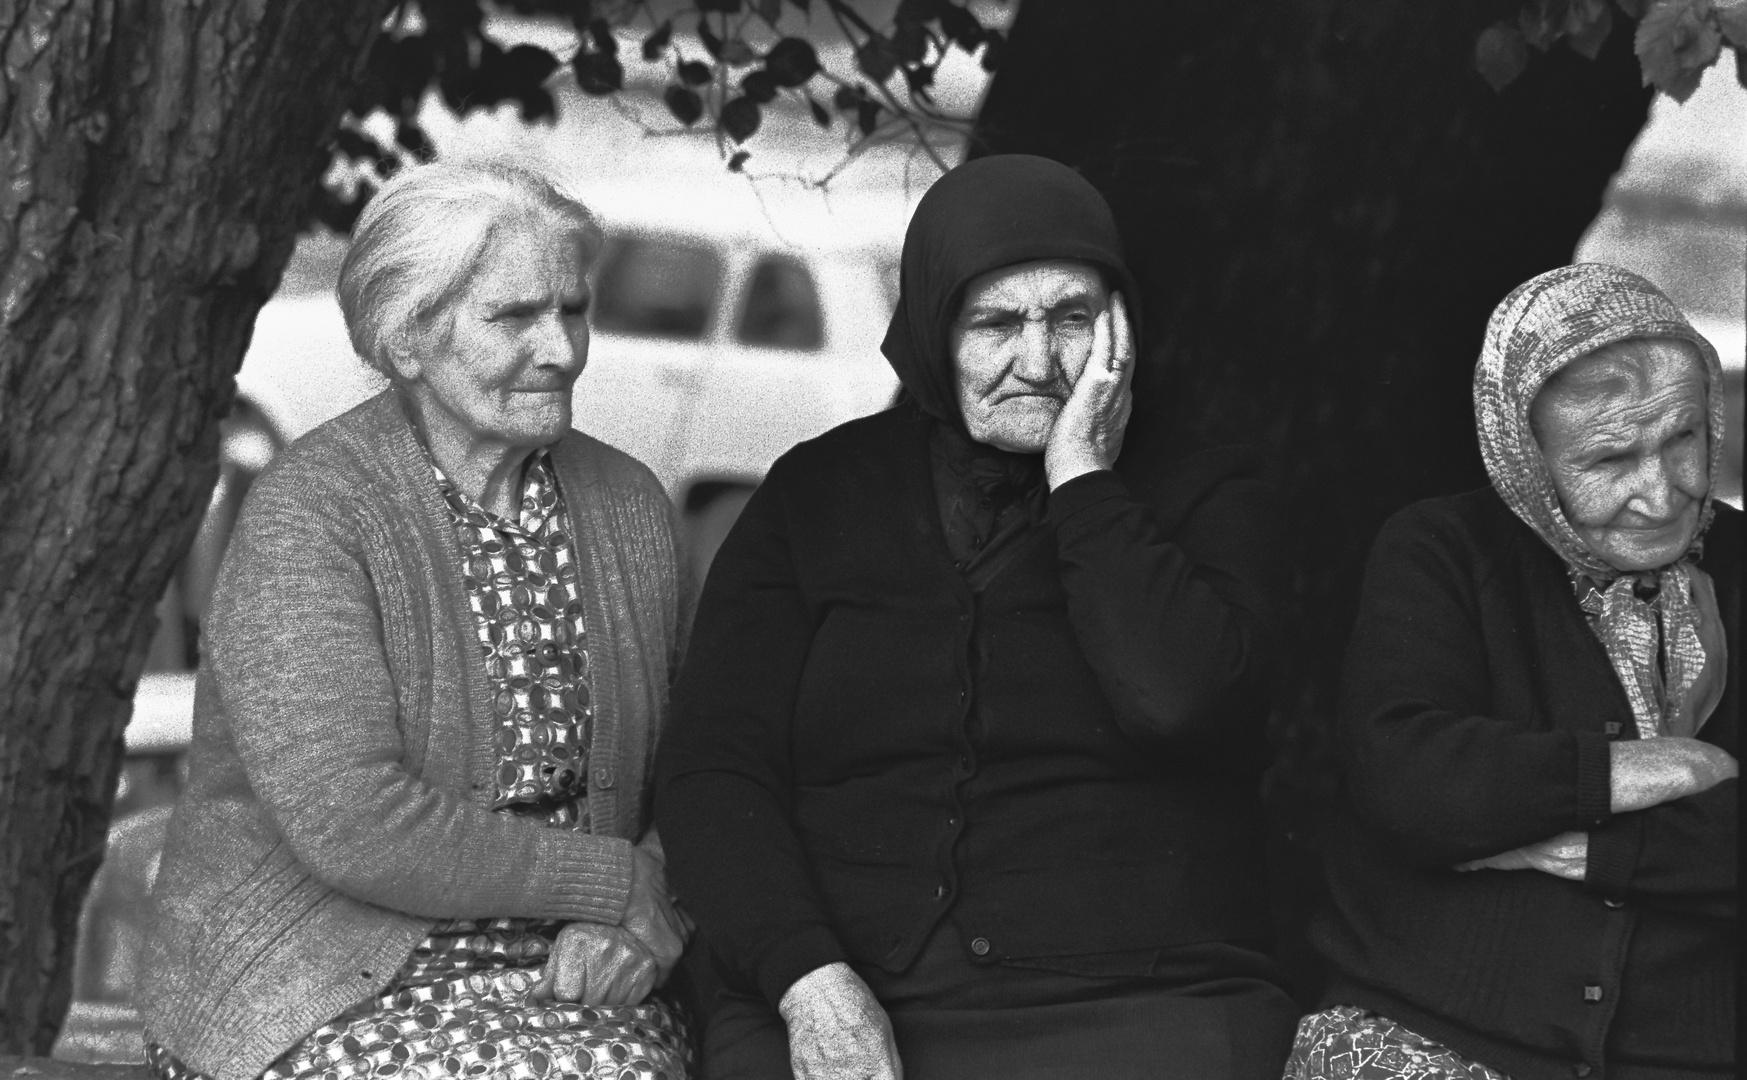 MULLERES . mujeres gallegas.